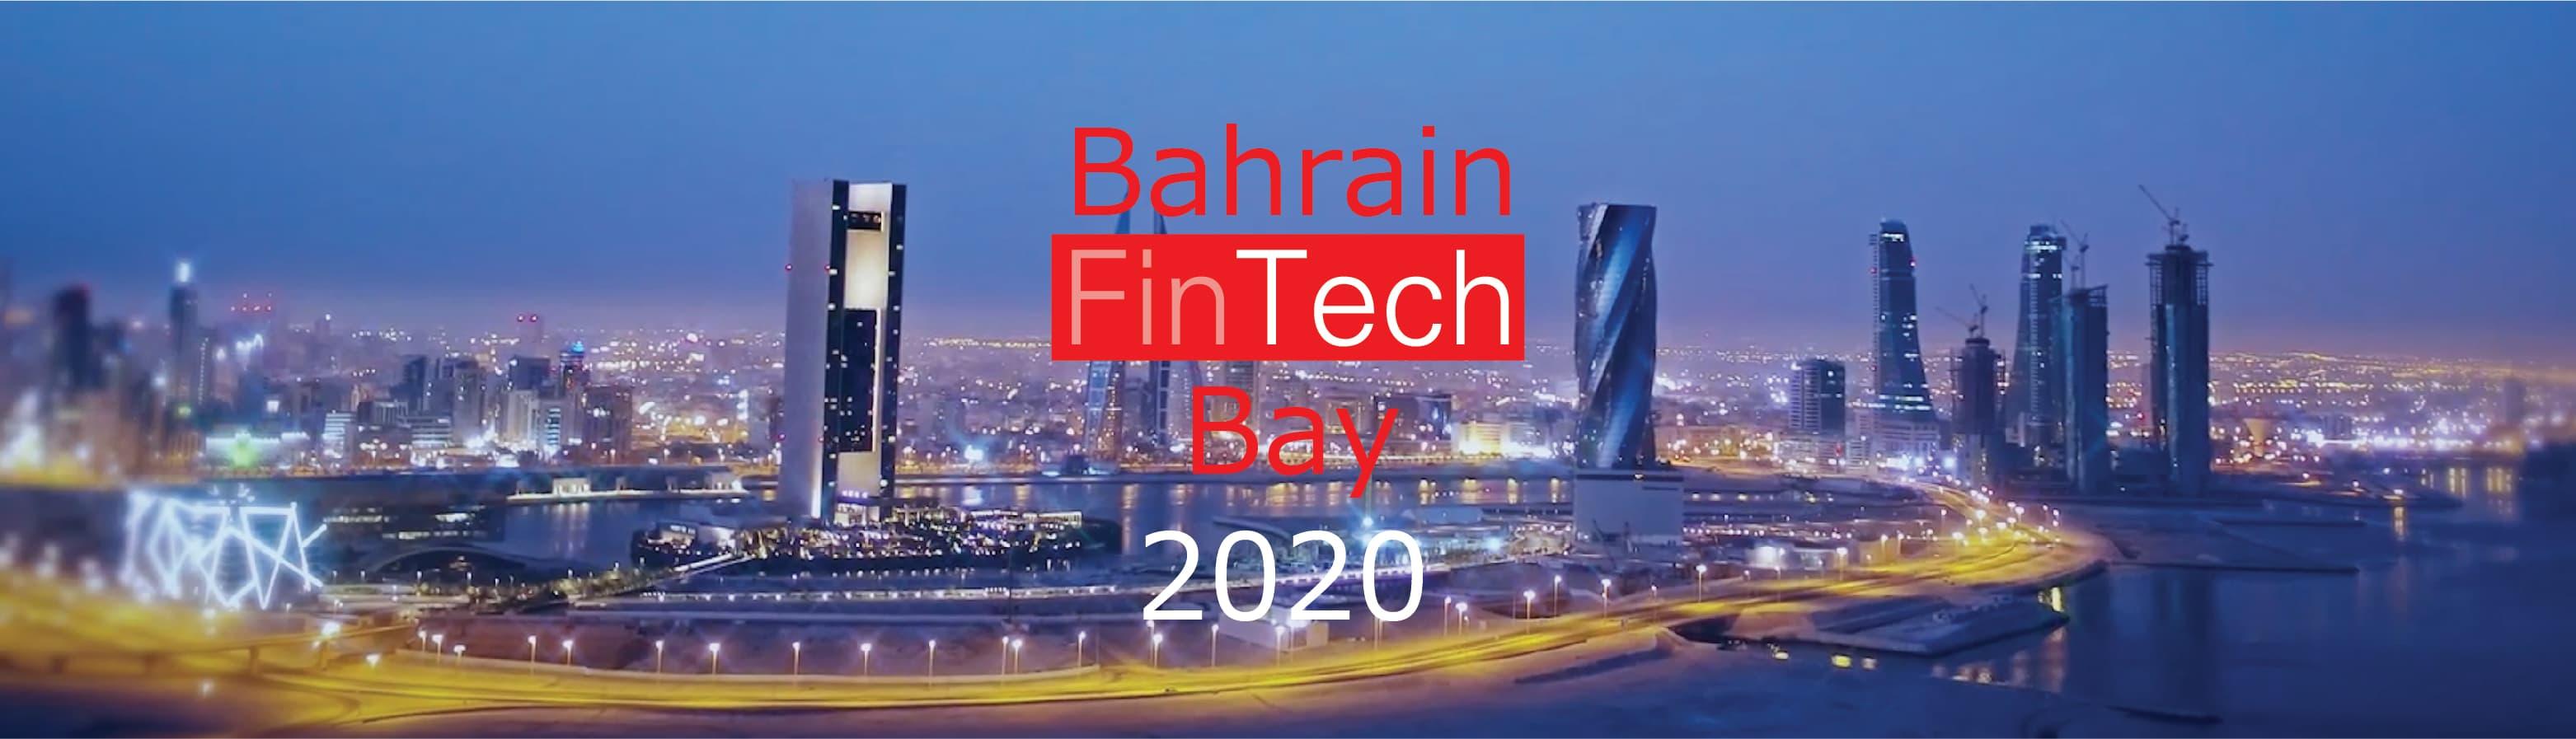 Fintech in Bahrain